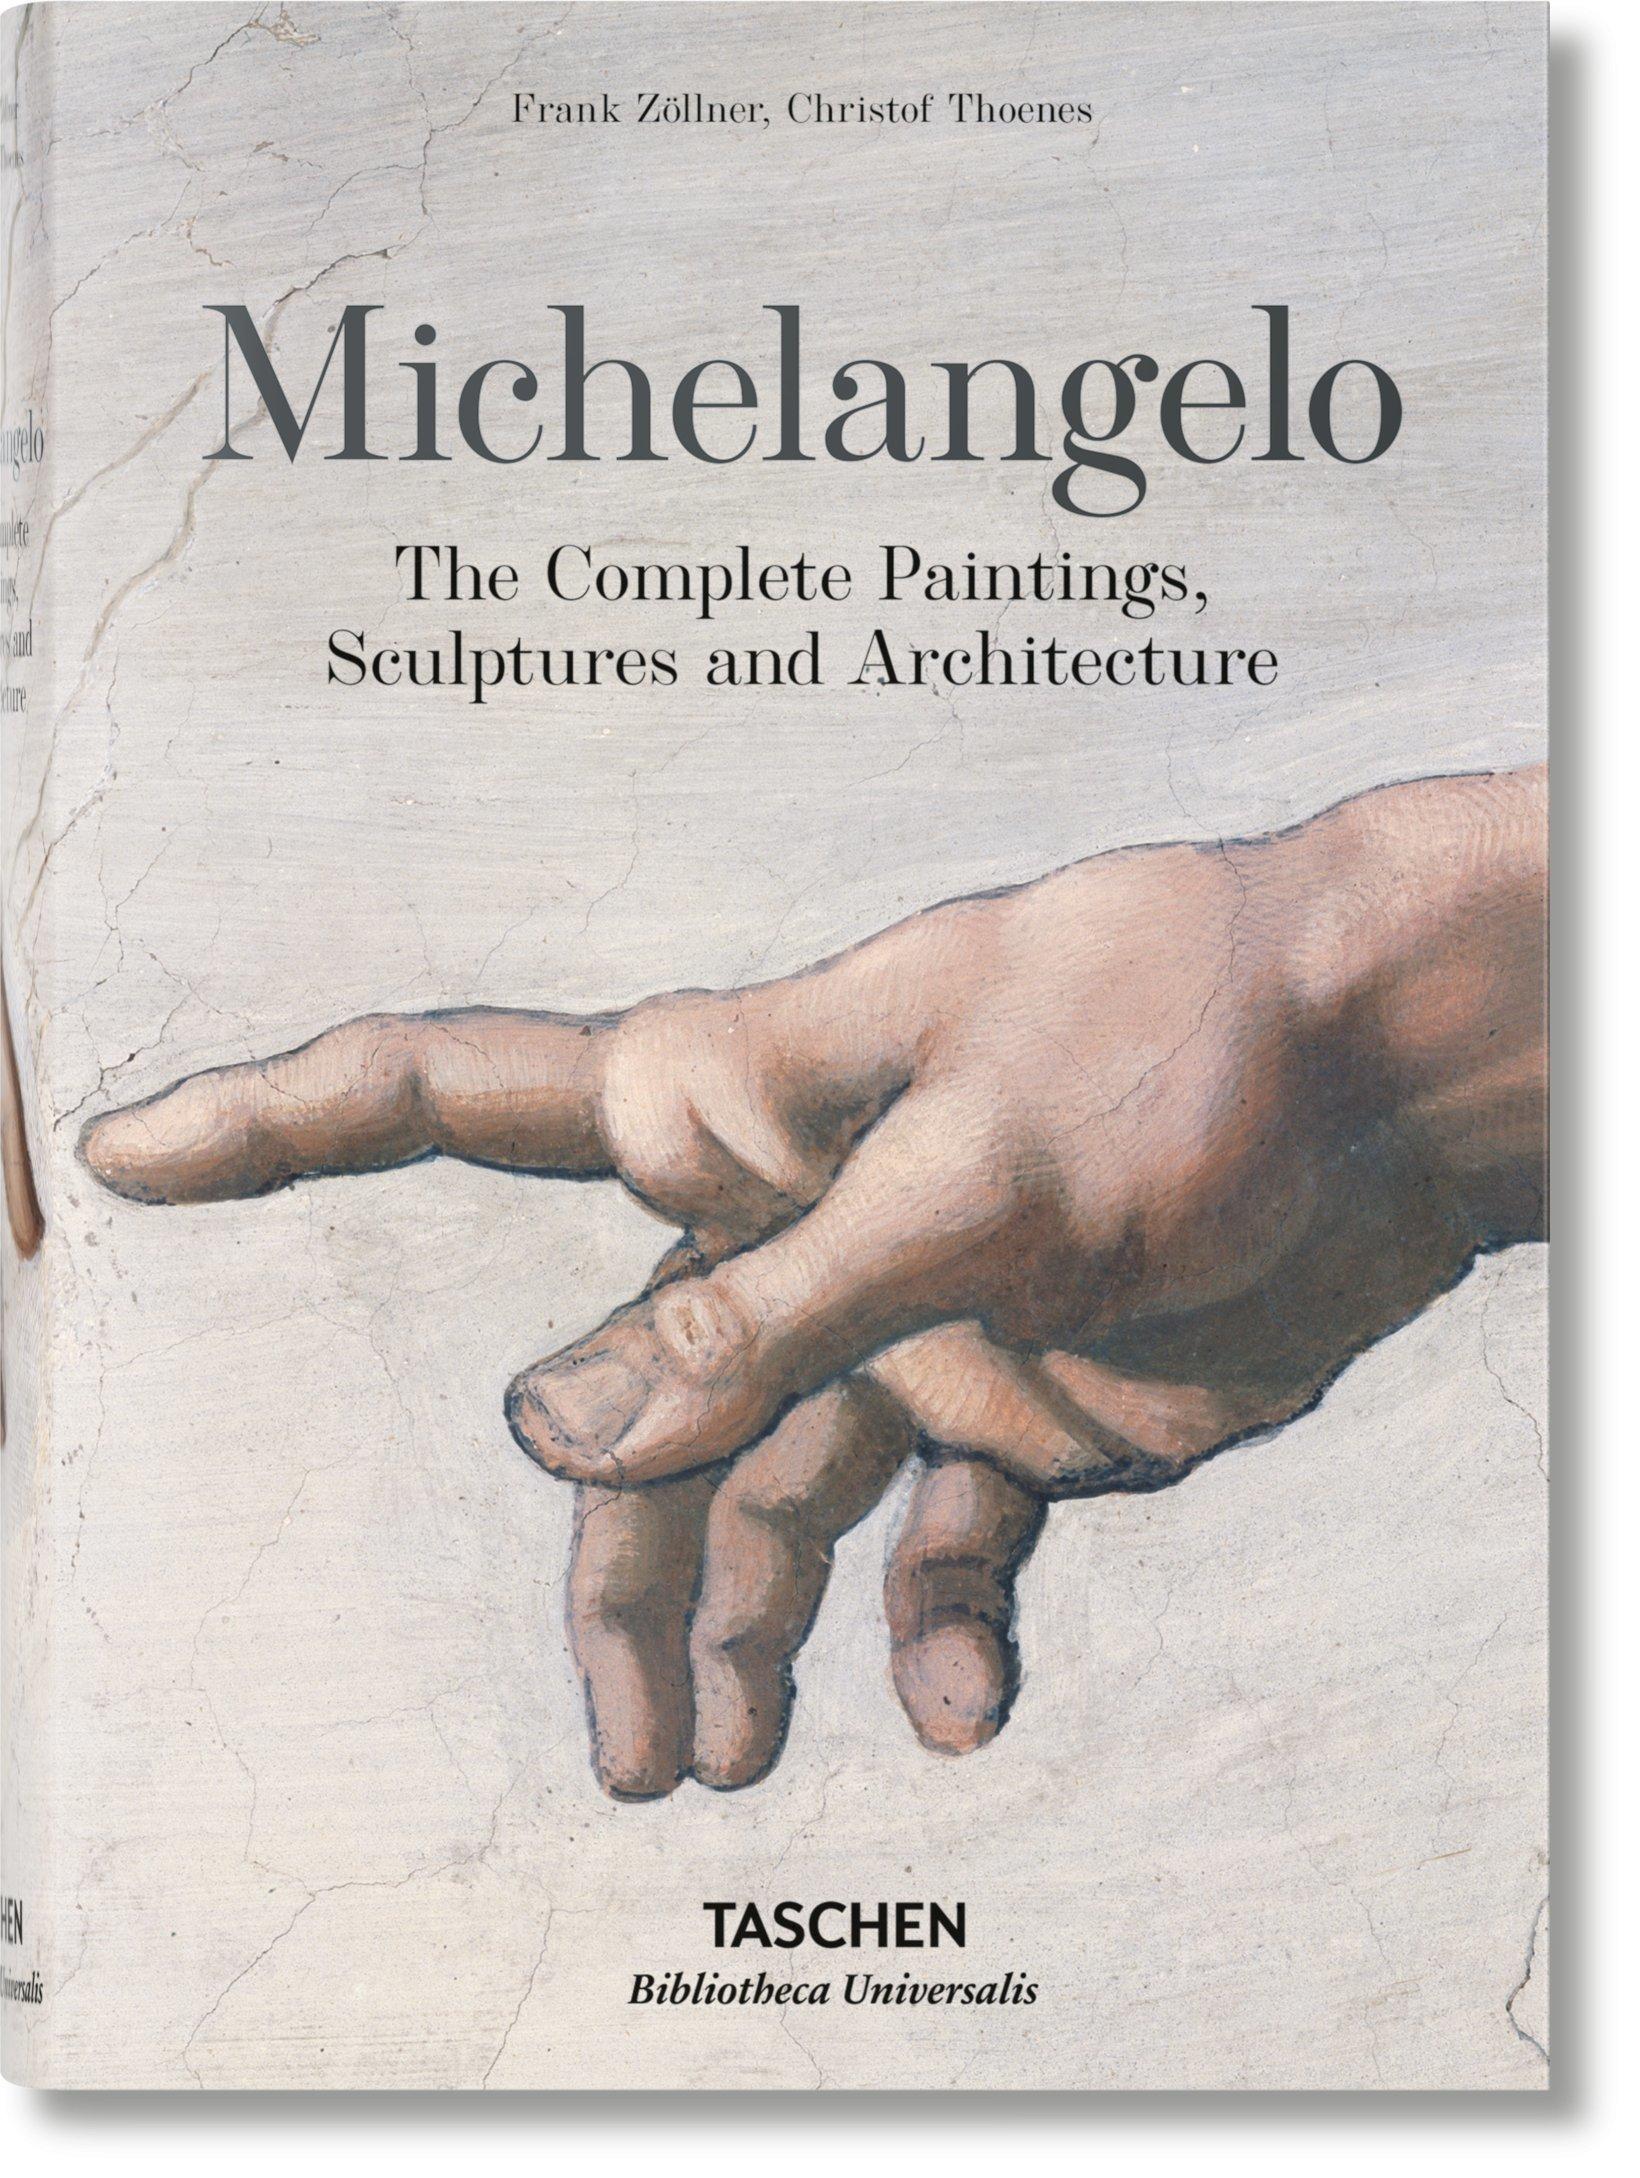 Michelangelo. The Complete Paintings, Sculptures